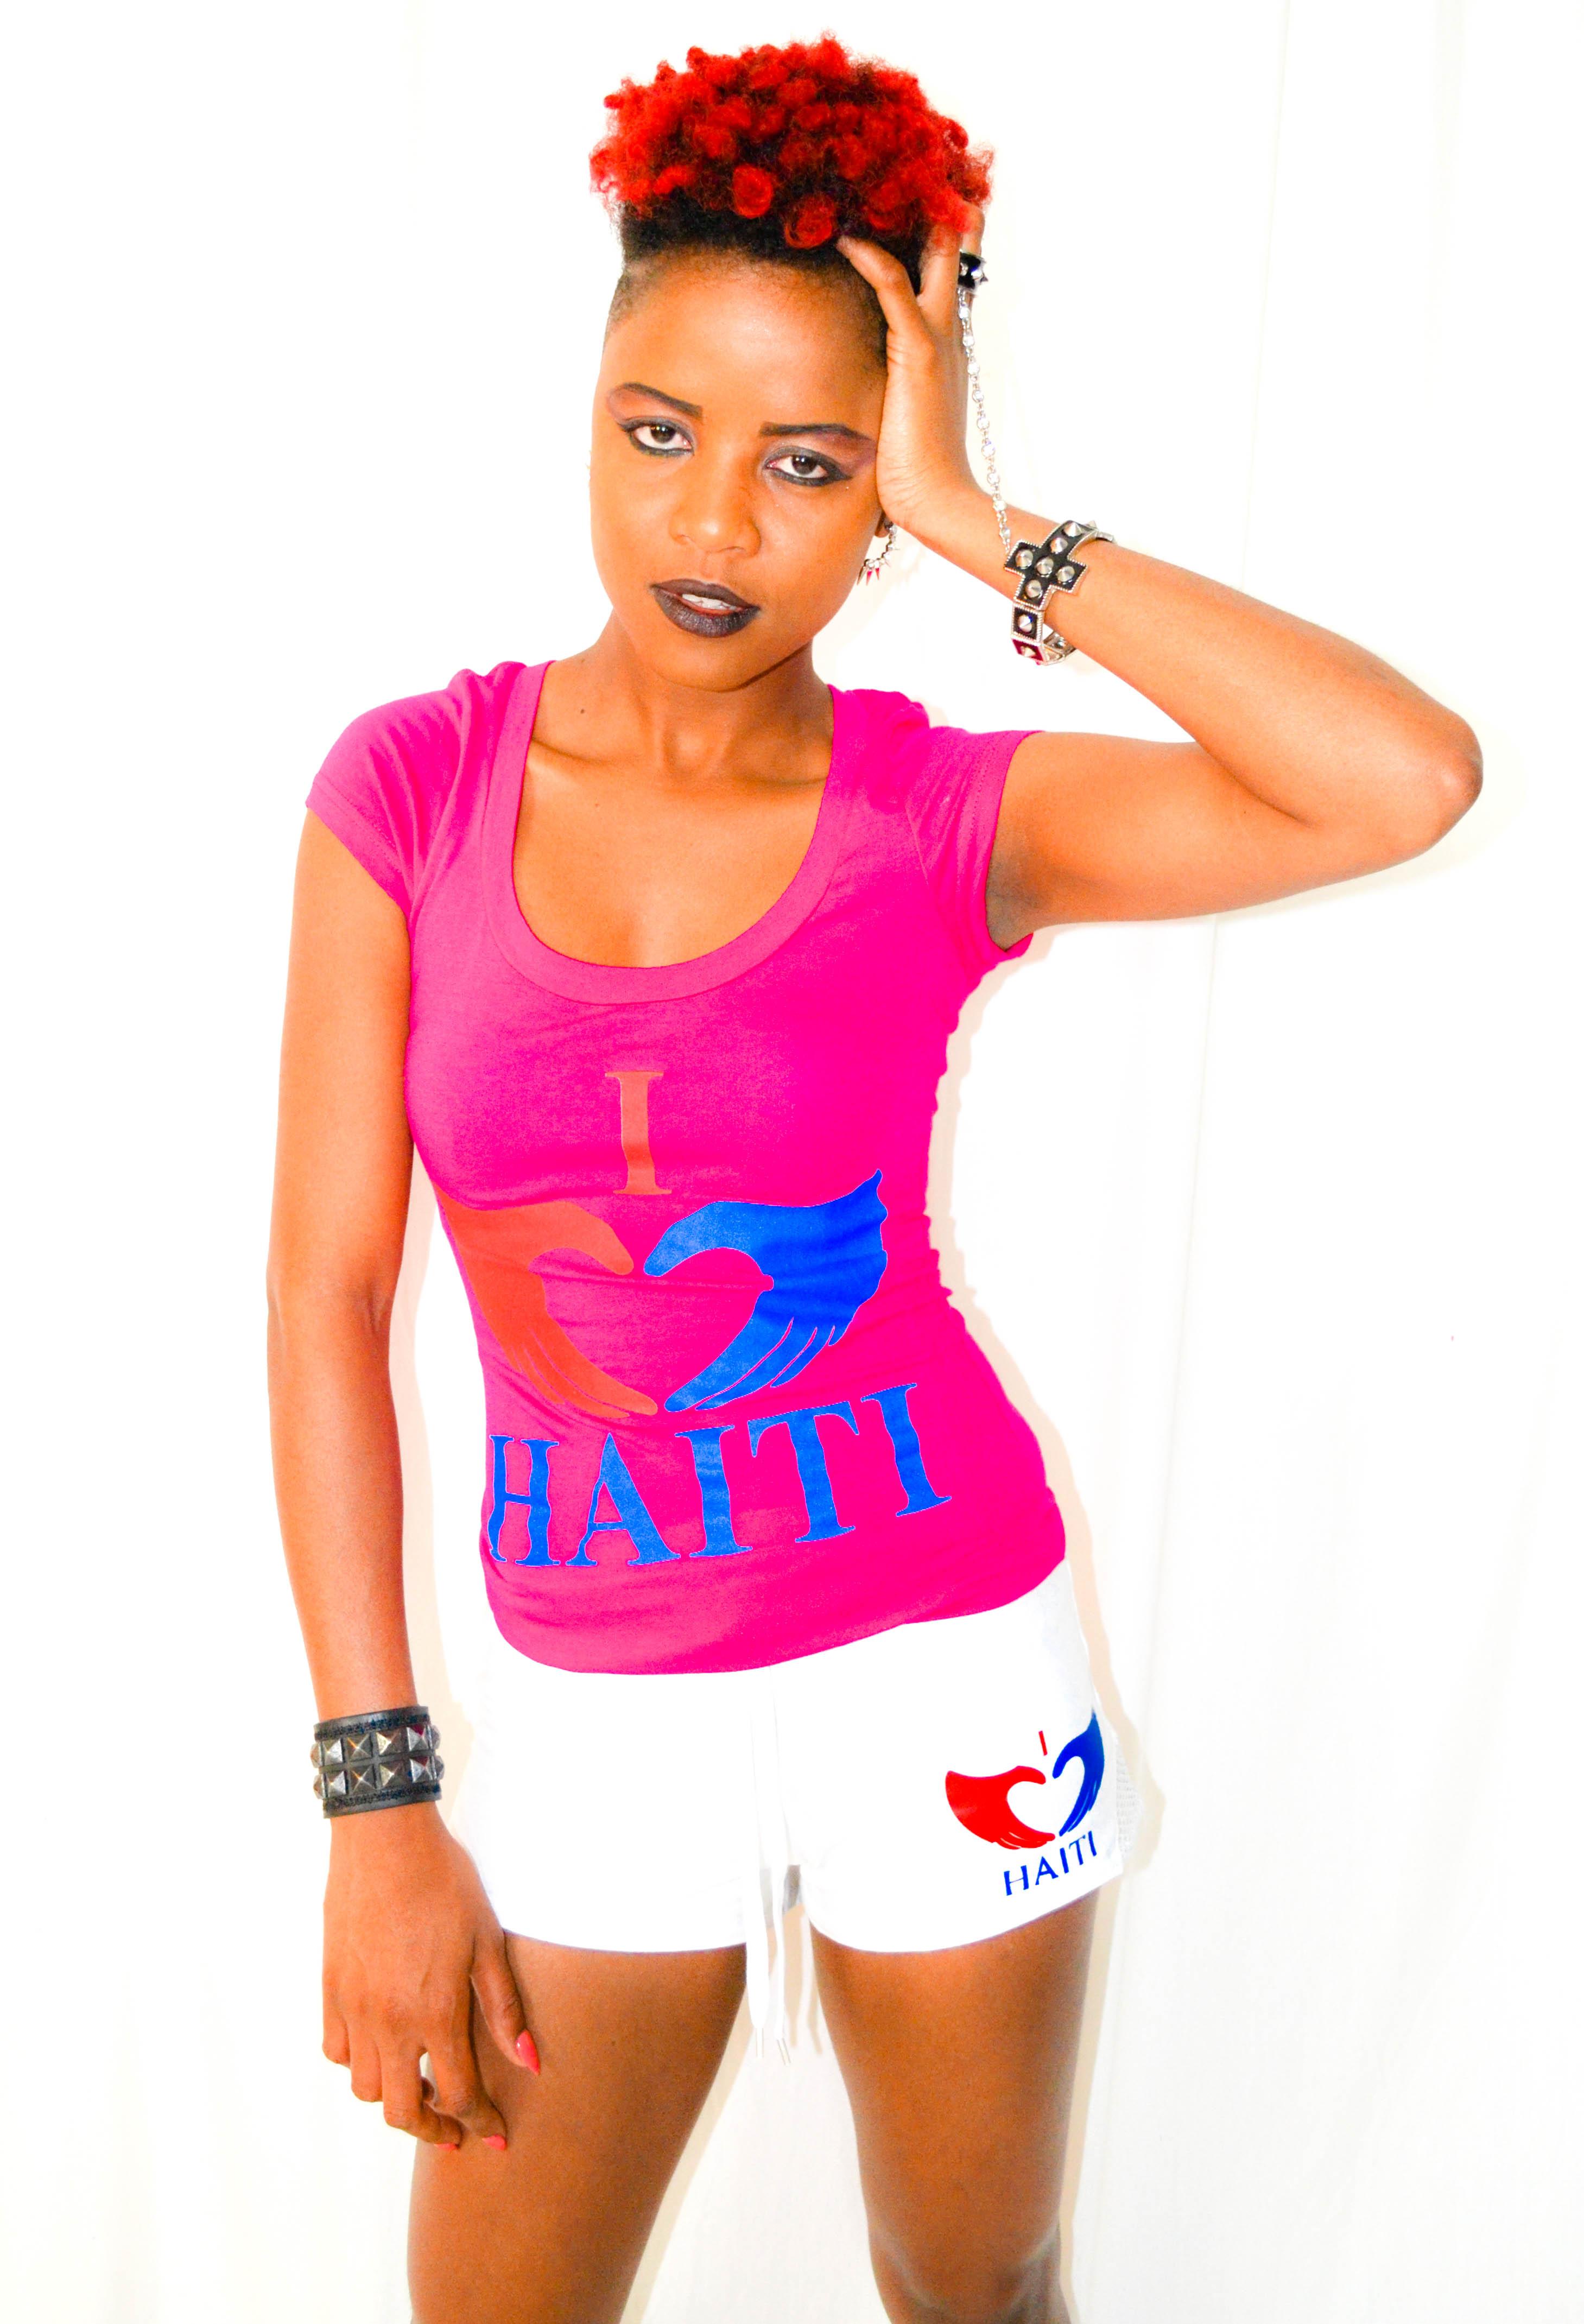 Scoop Neck I Love Haiti T-shirt